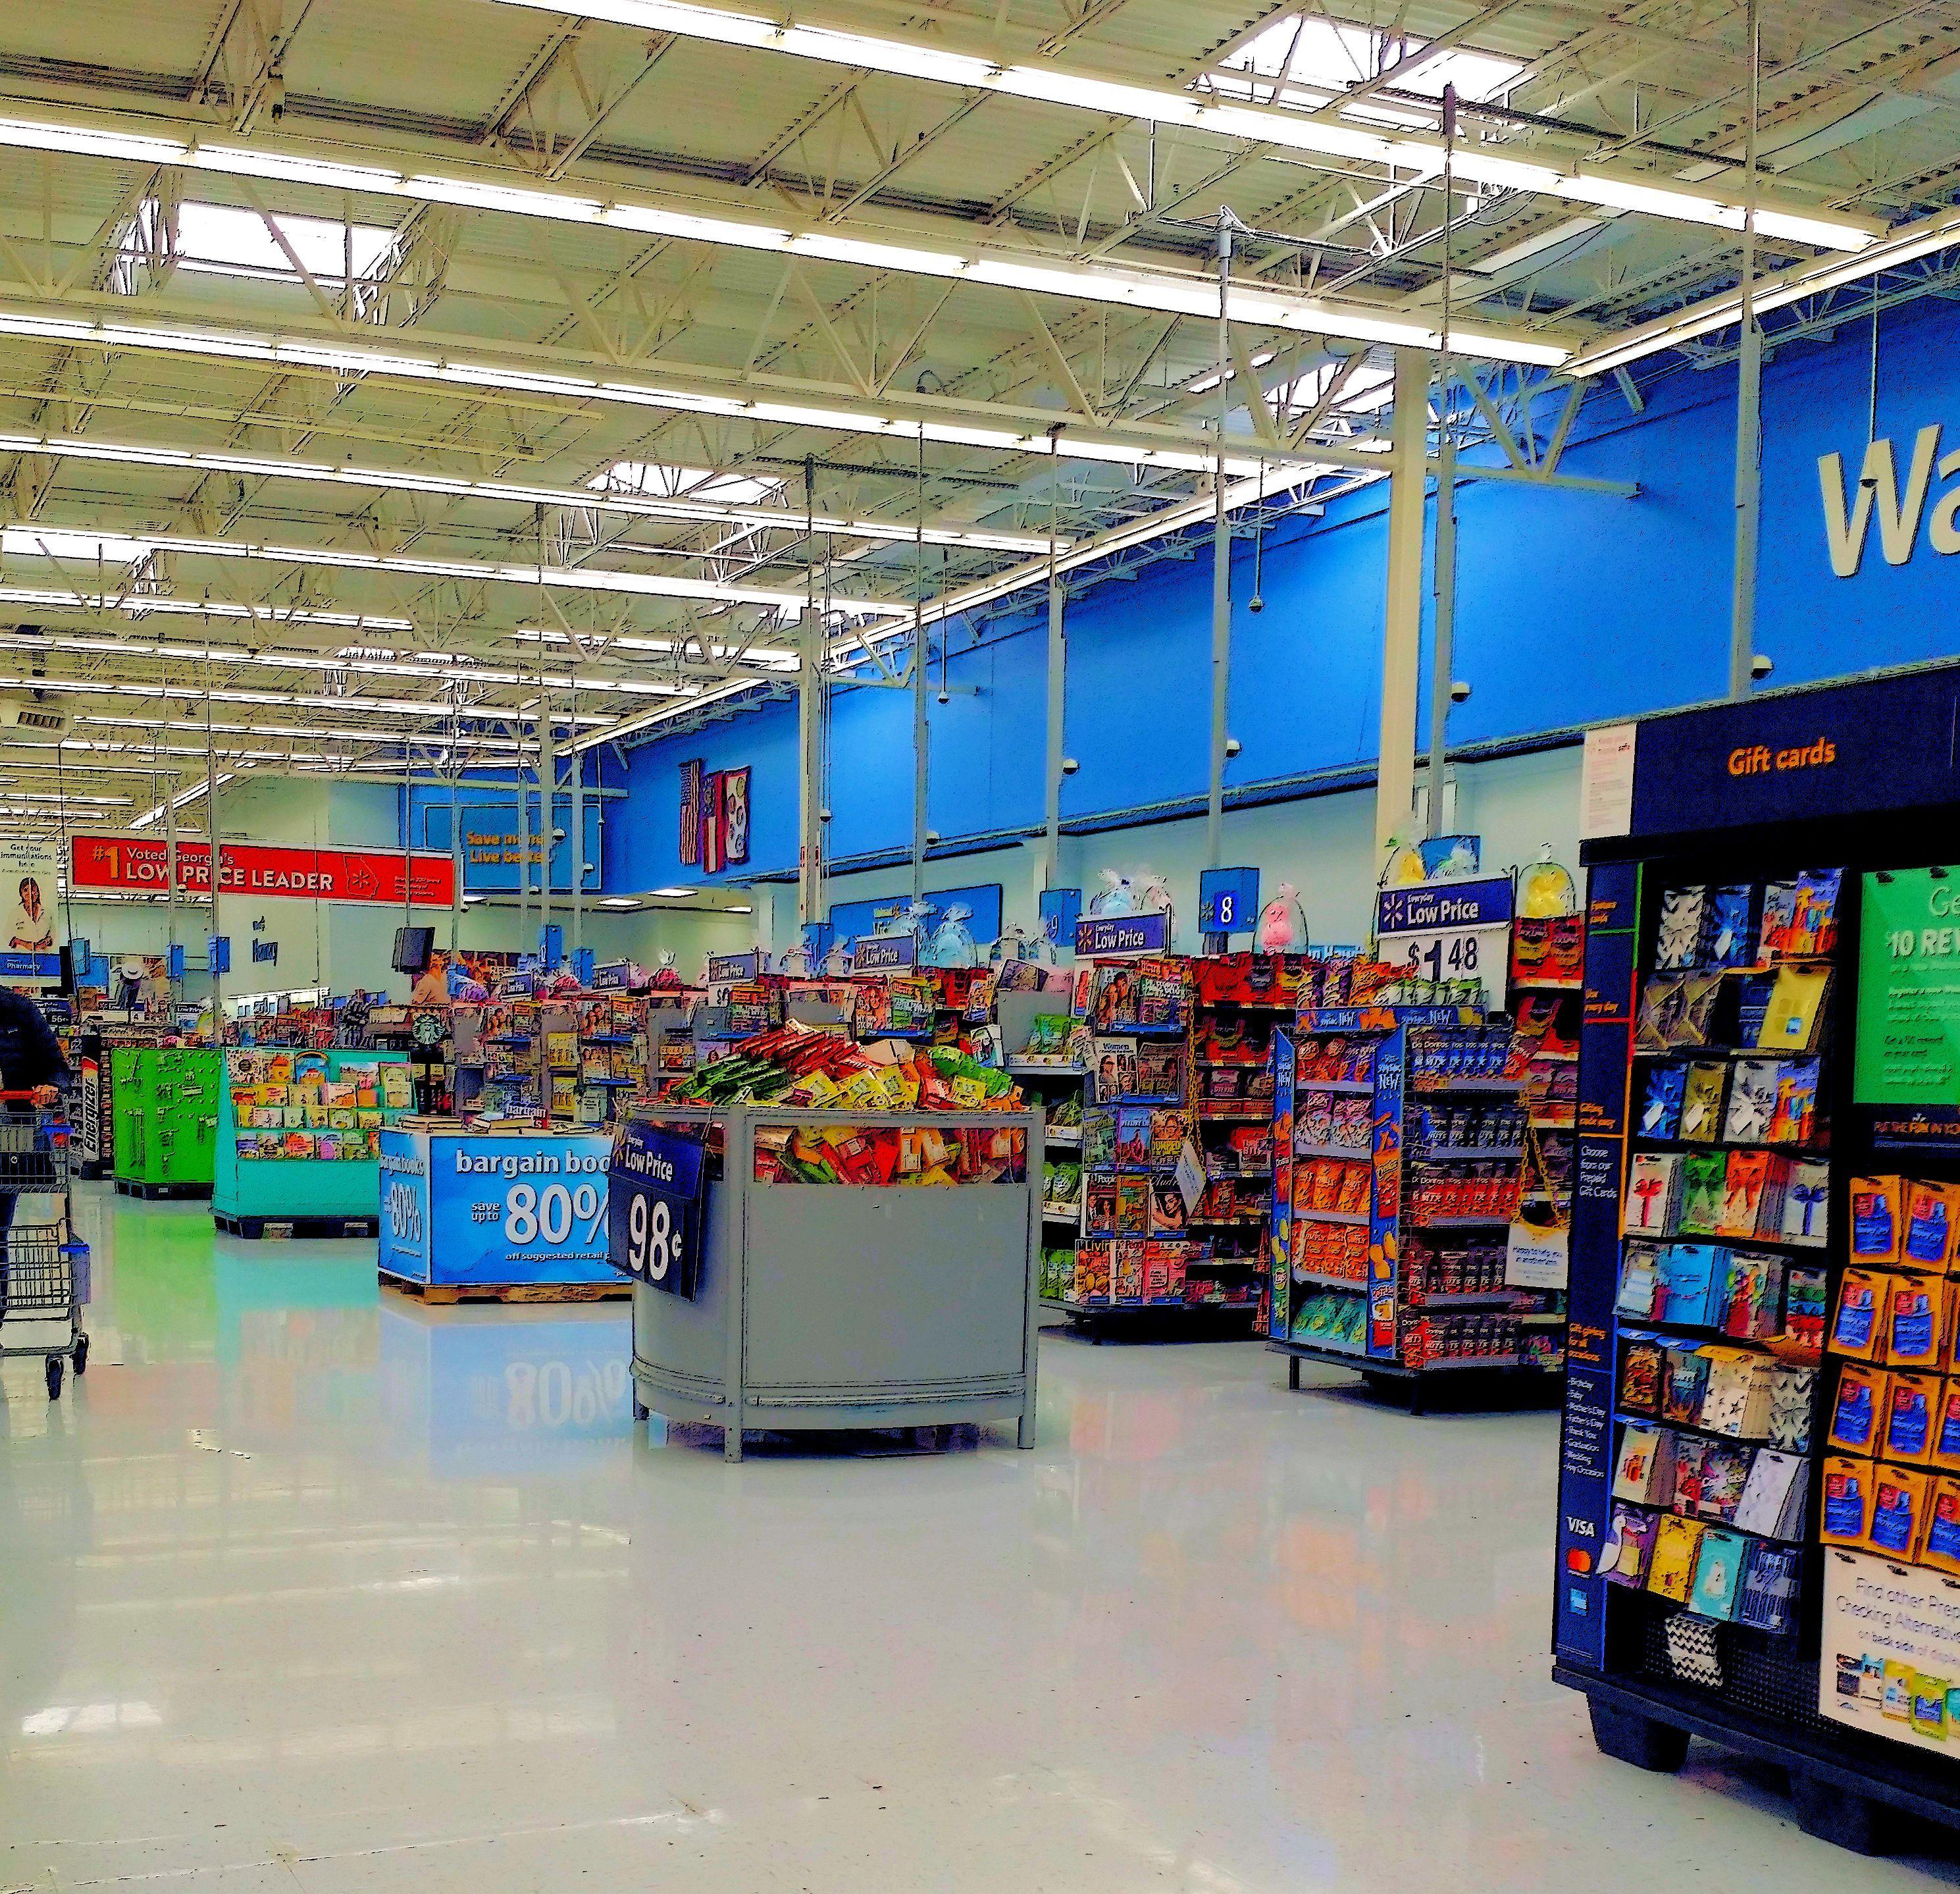 Walmart Store Interior Mar 2018 Store Interior Walmart Store